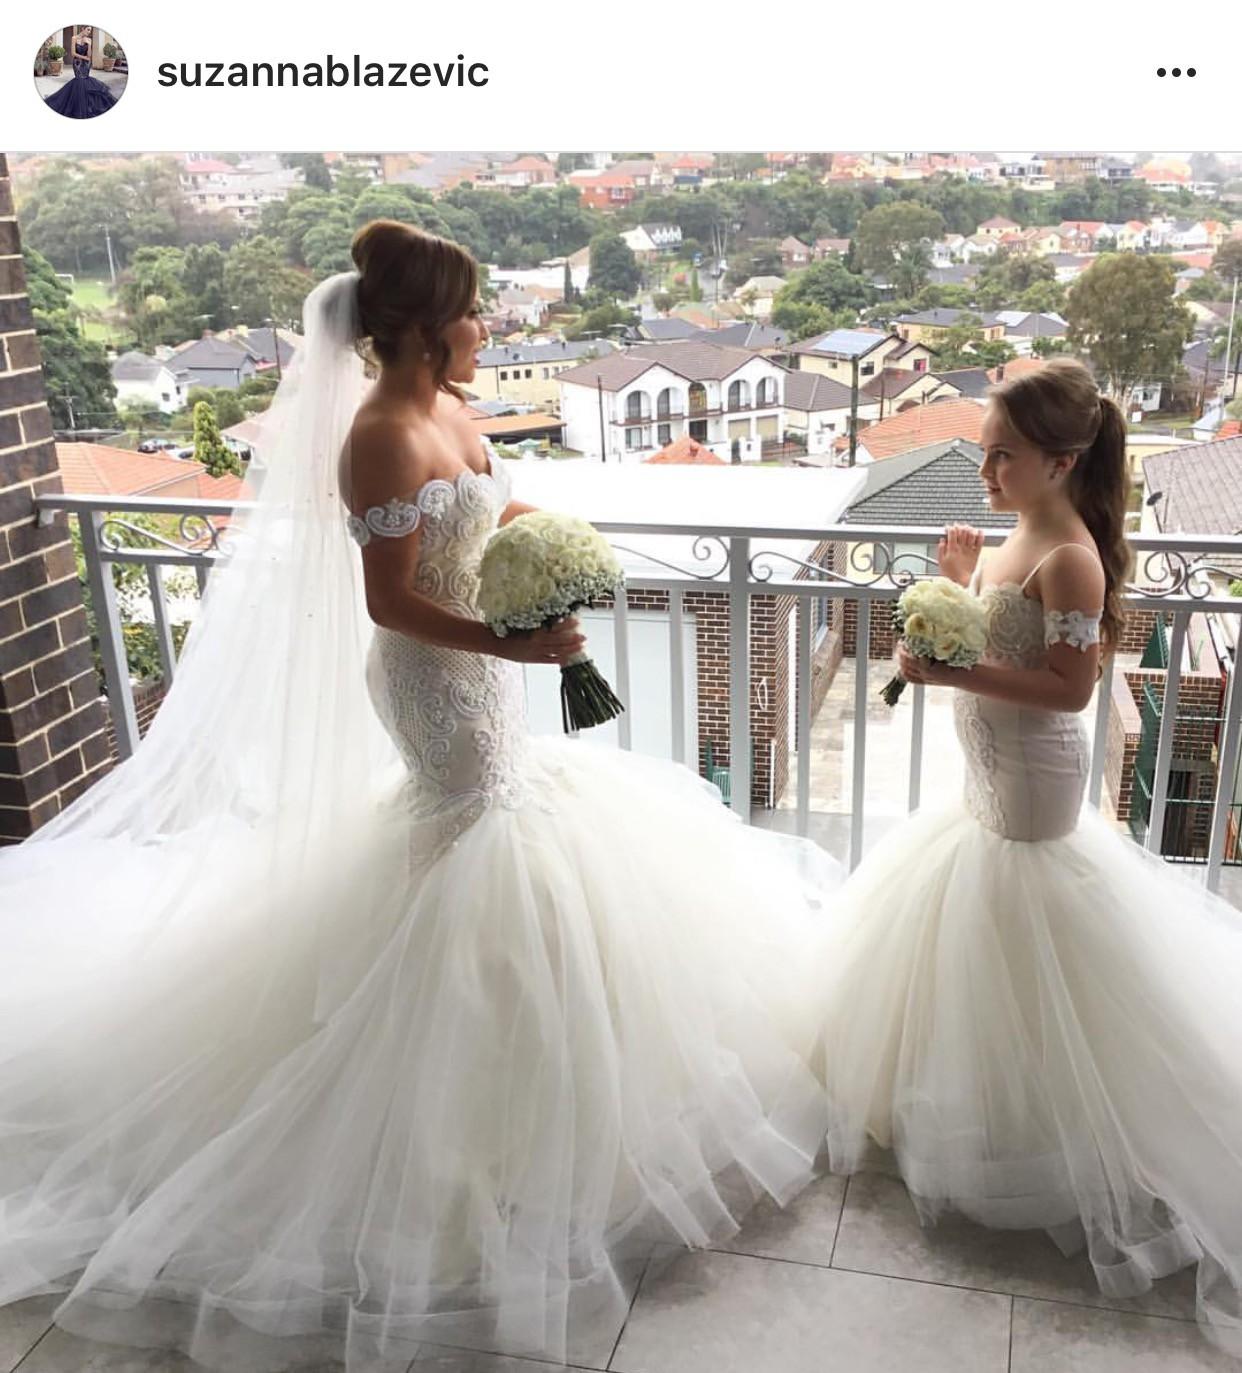 Suzanna blazevic custom made preowned wedding dress on sale for Suzanna blazevic wedding dresses